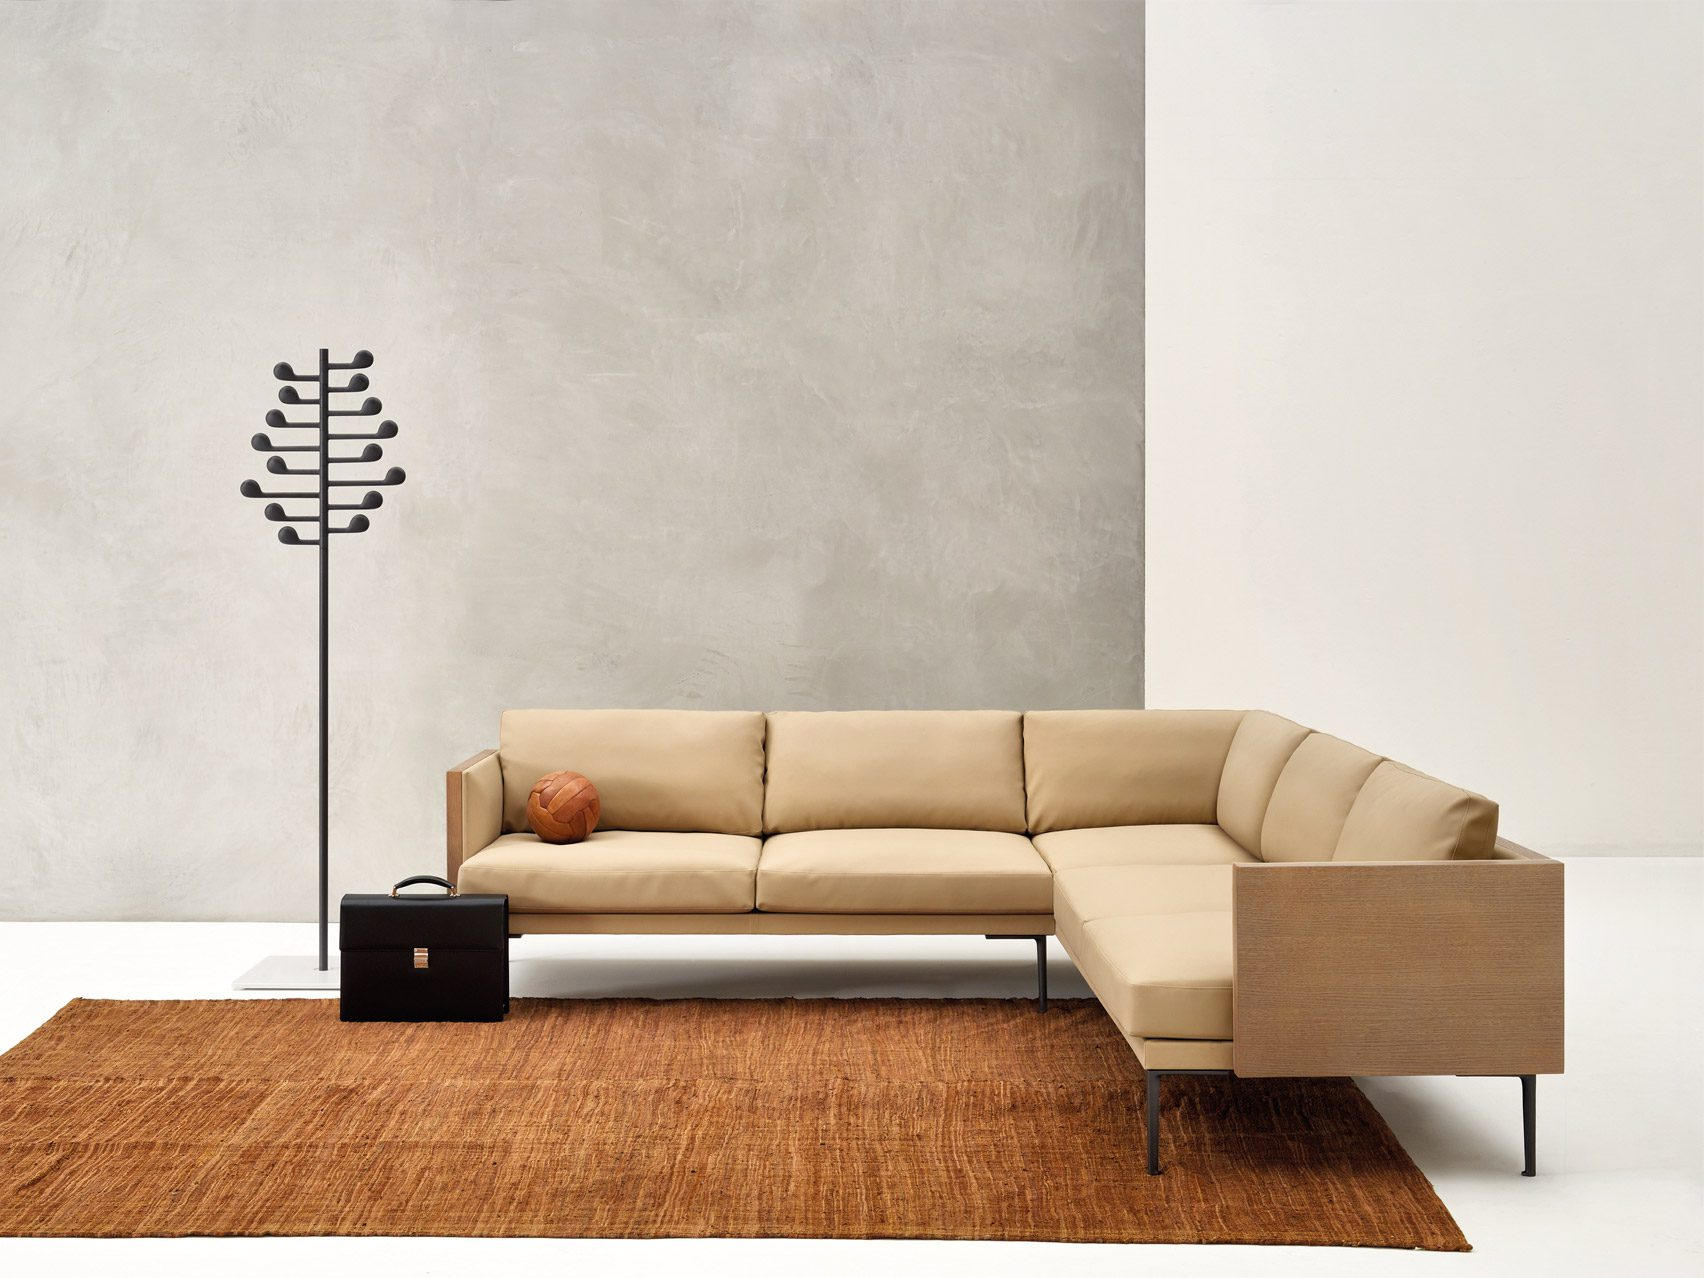 A cream-coloured sofa